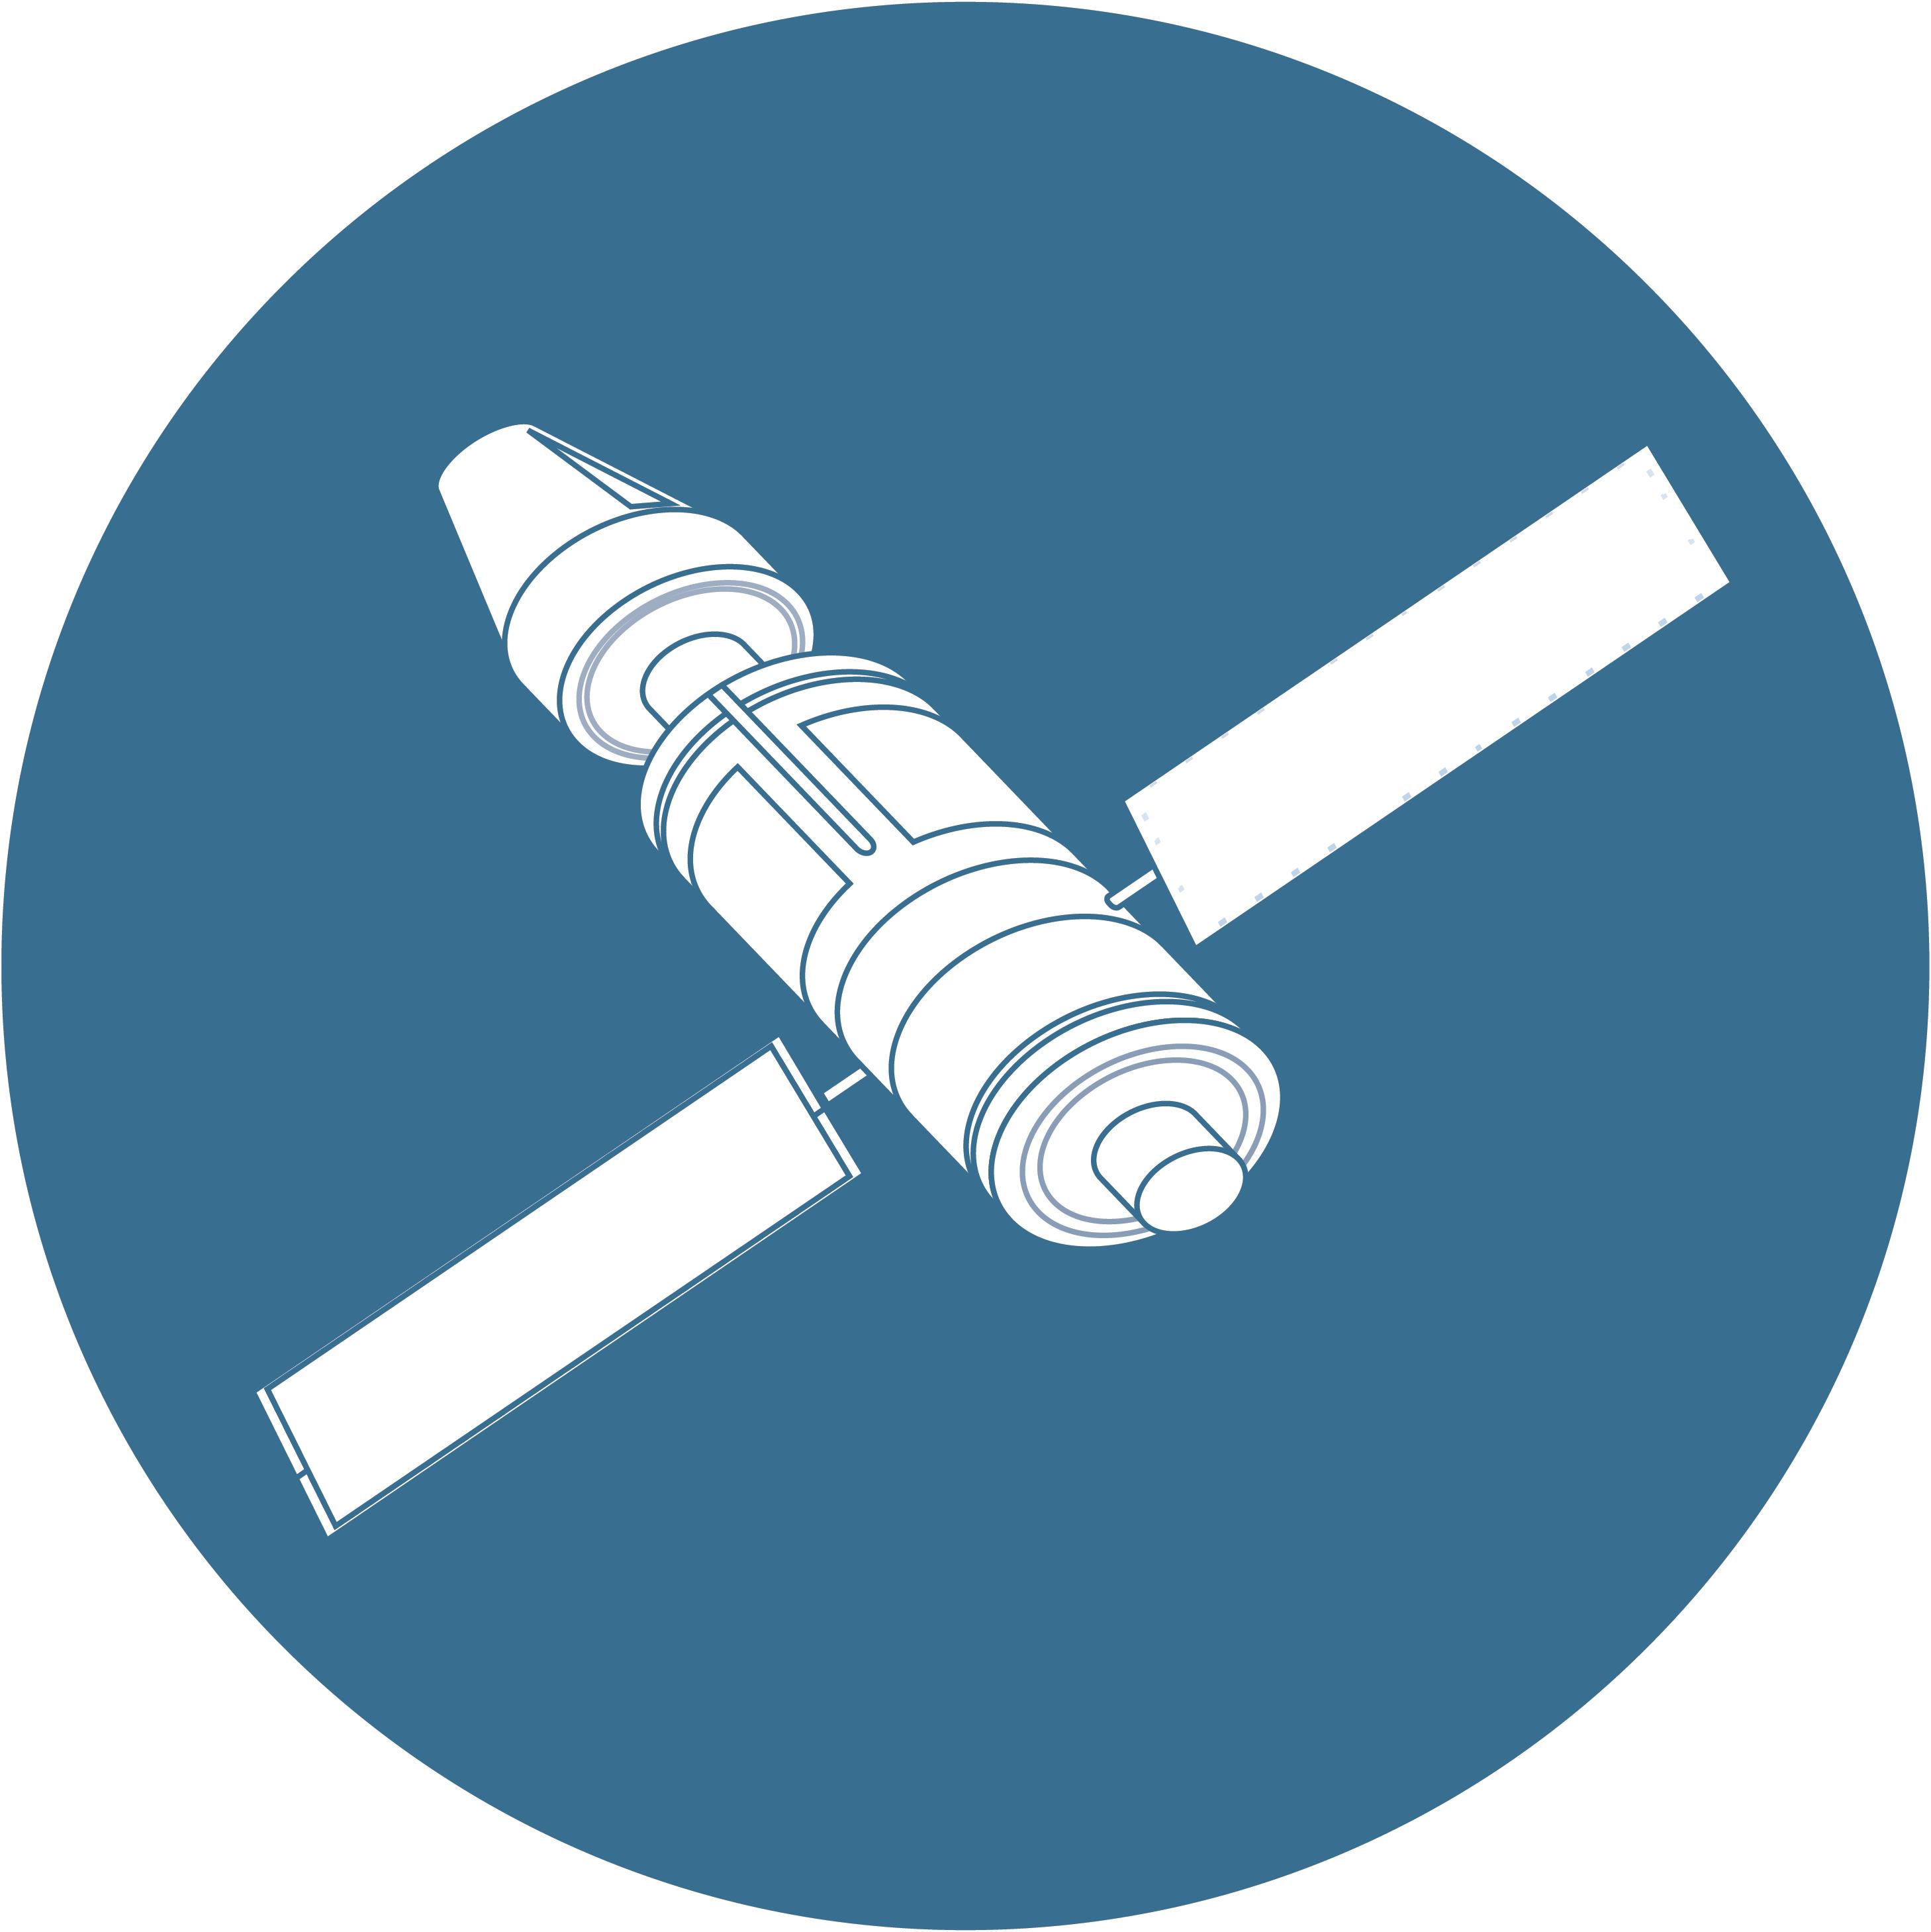 11. SRS-02